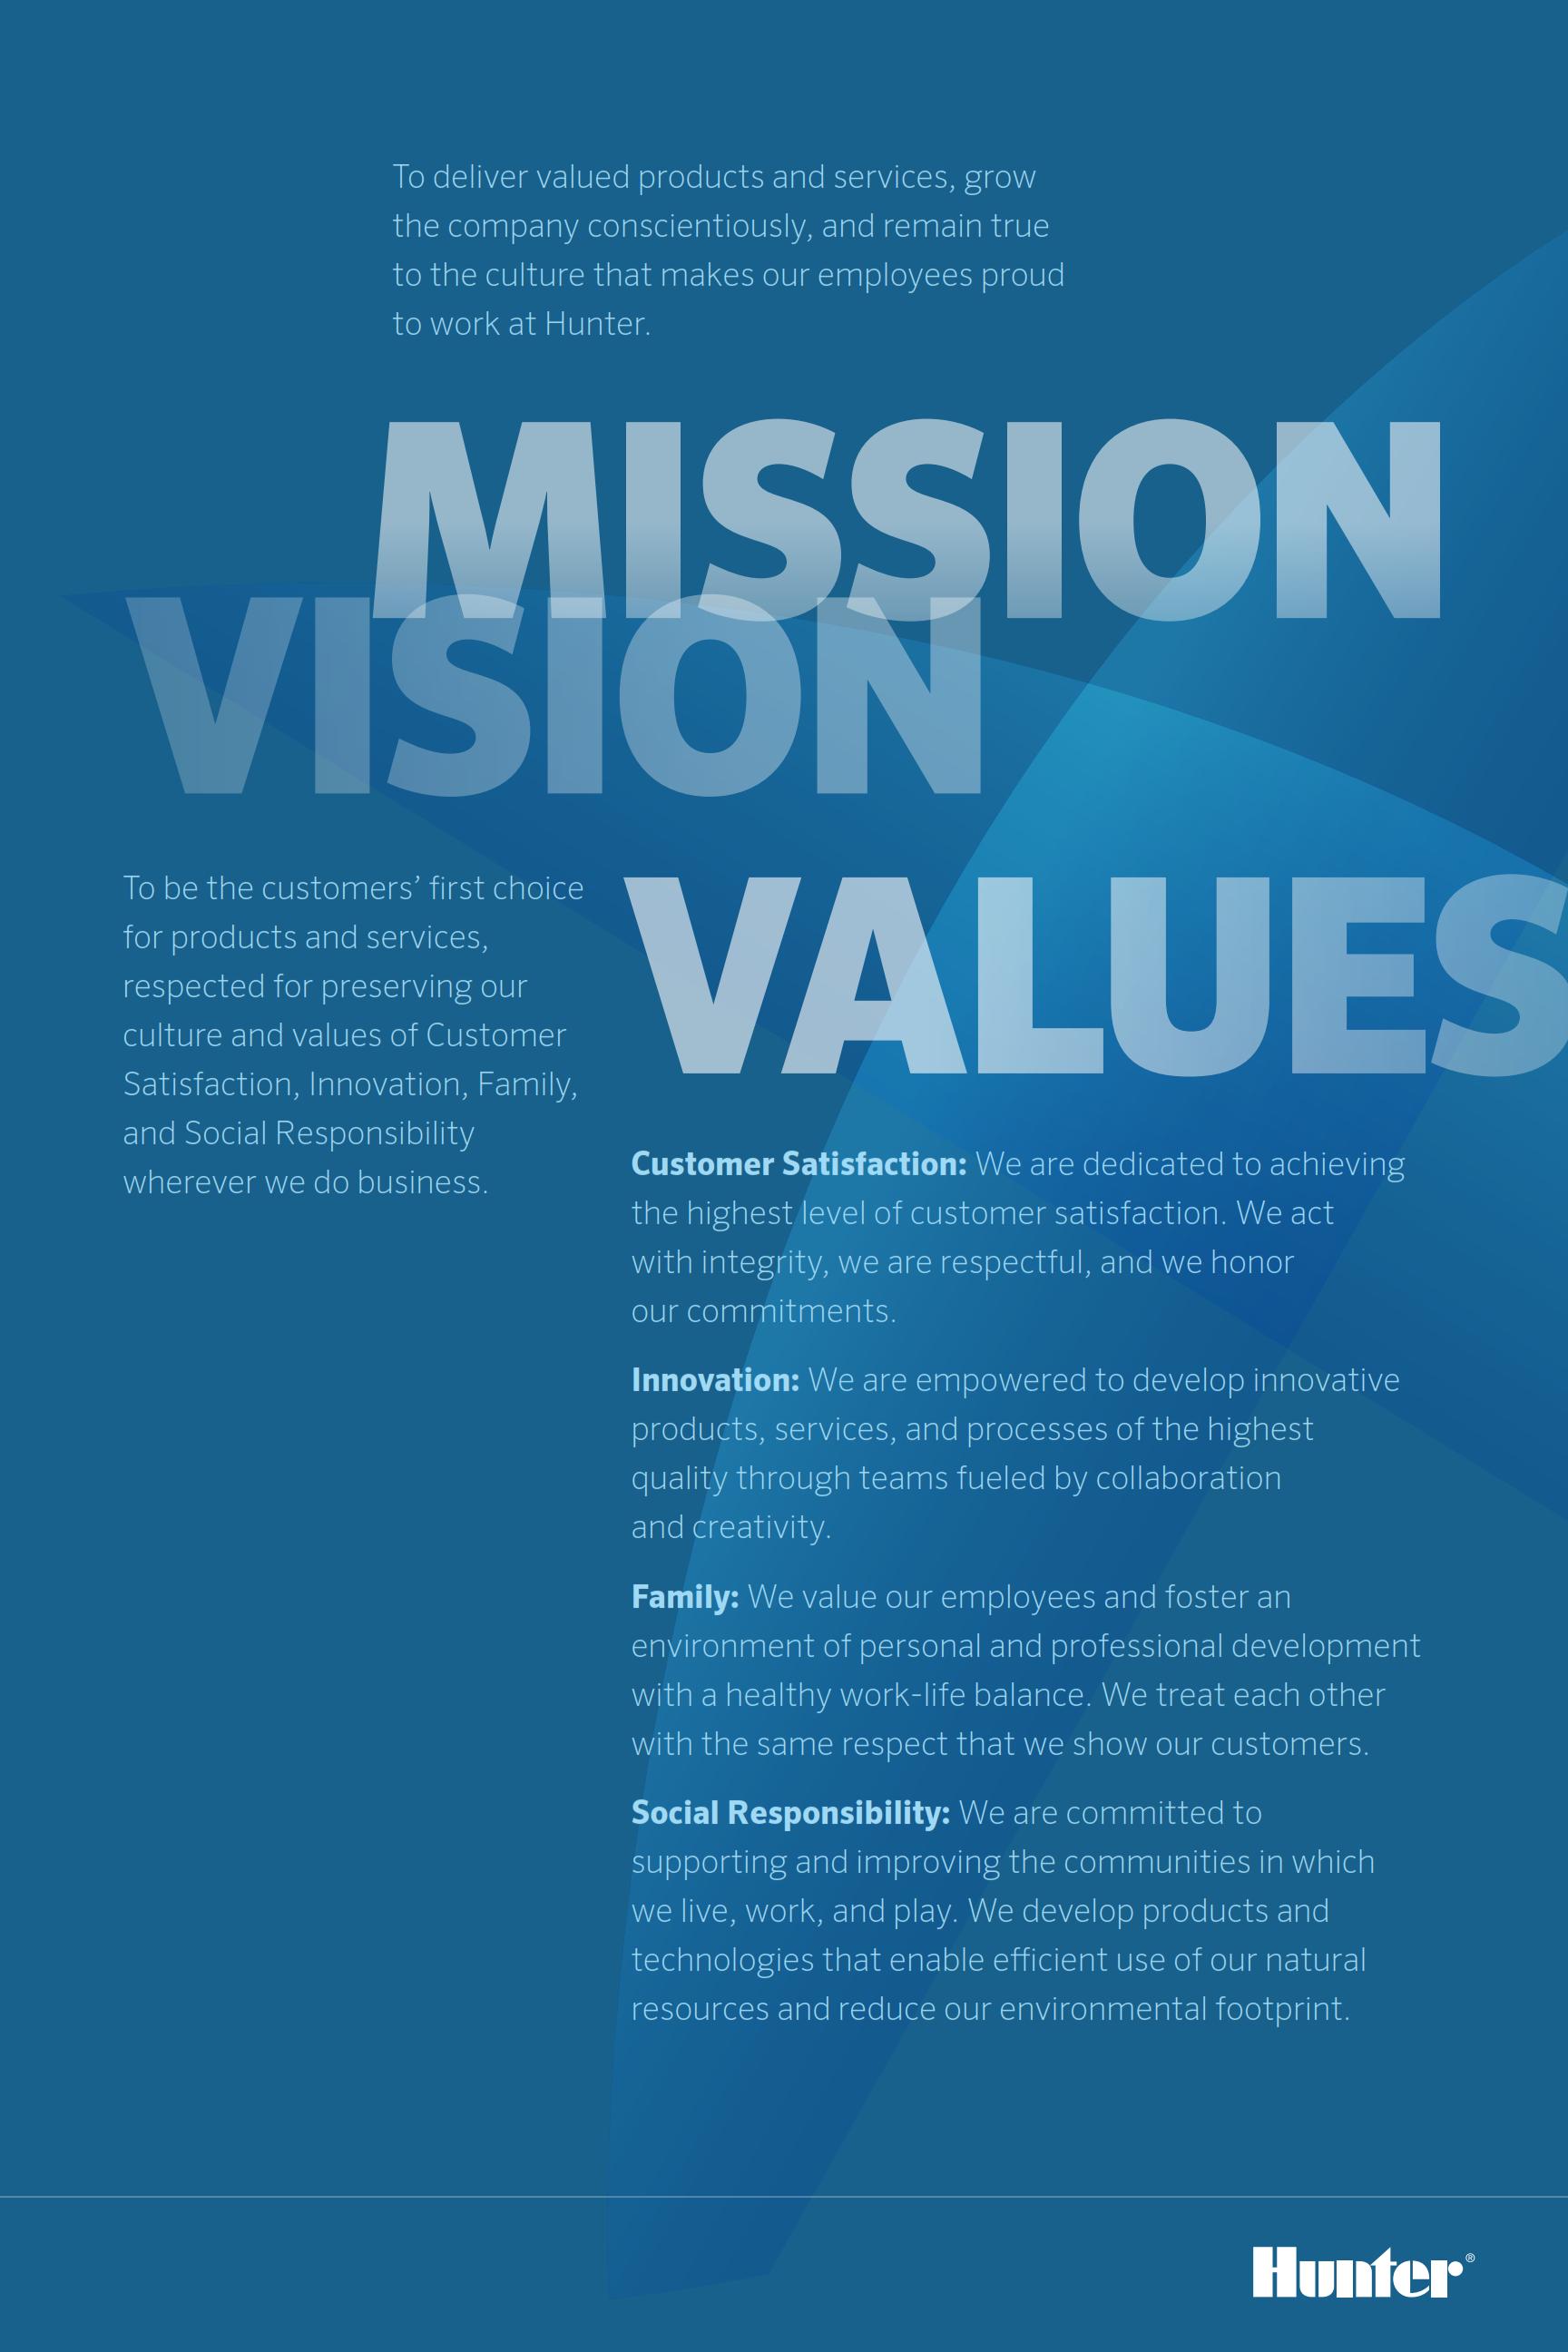 Image Result For Mission Vision Values Poster